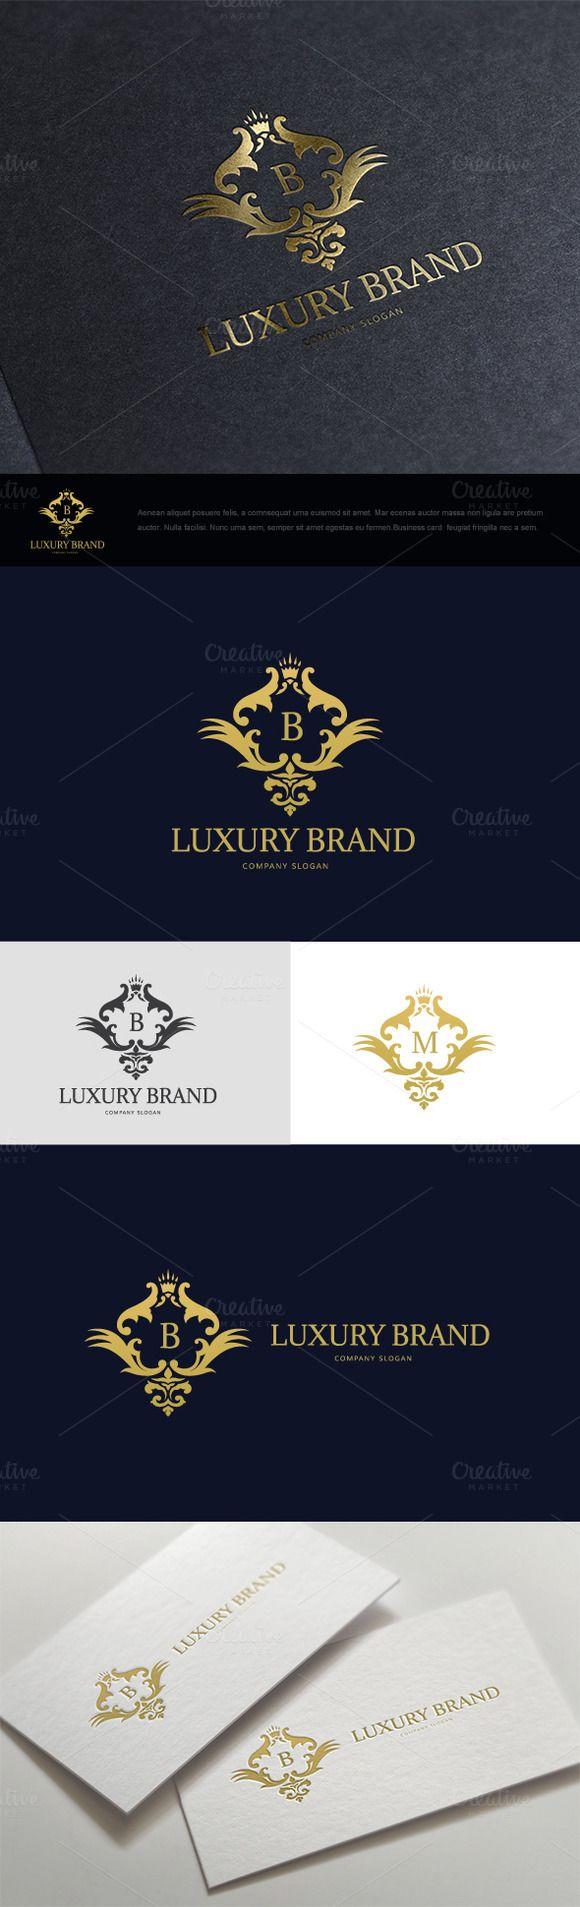 Luxury Brand Logo by Super Pig Shop on Creative Market